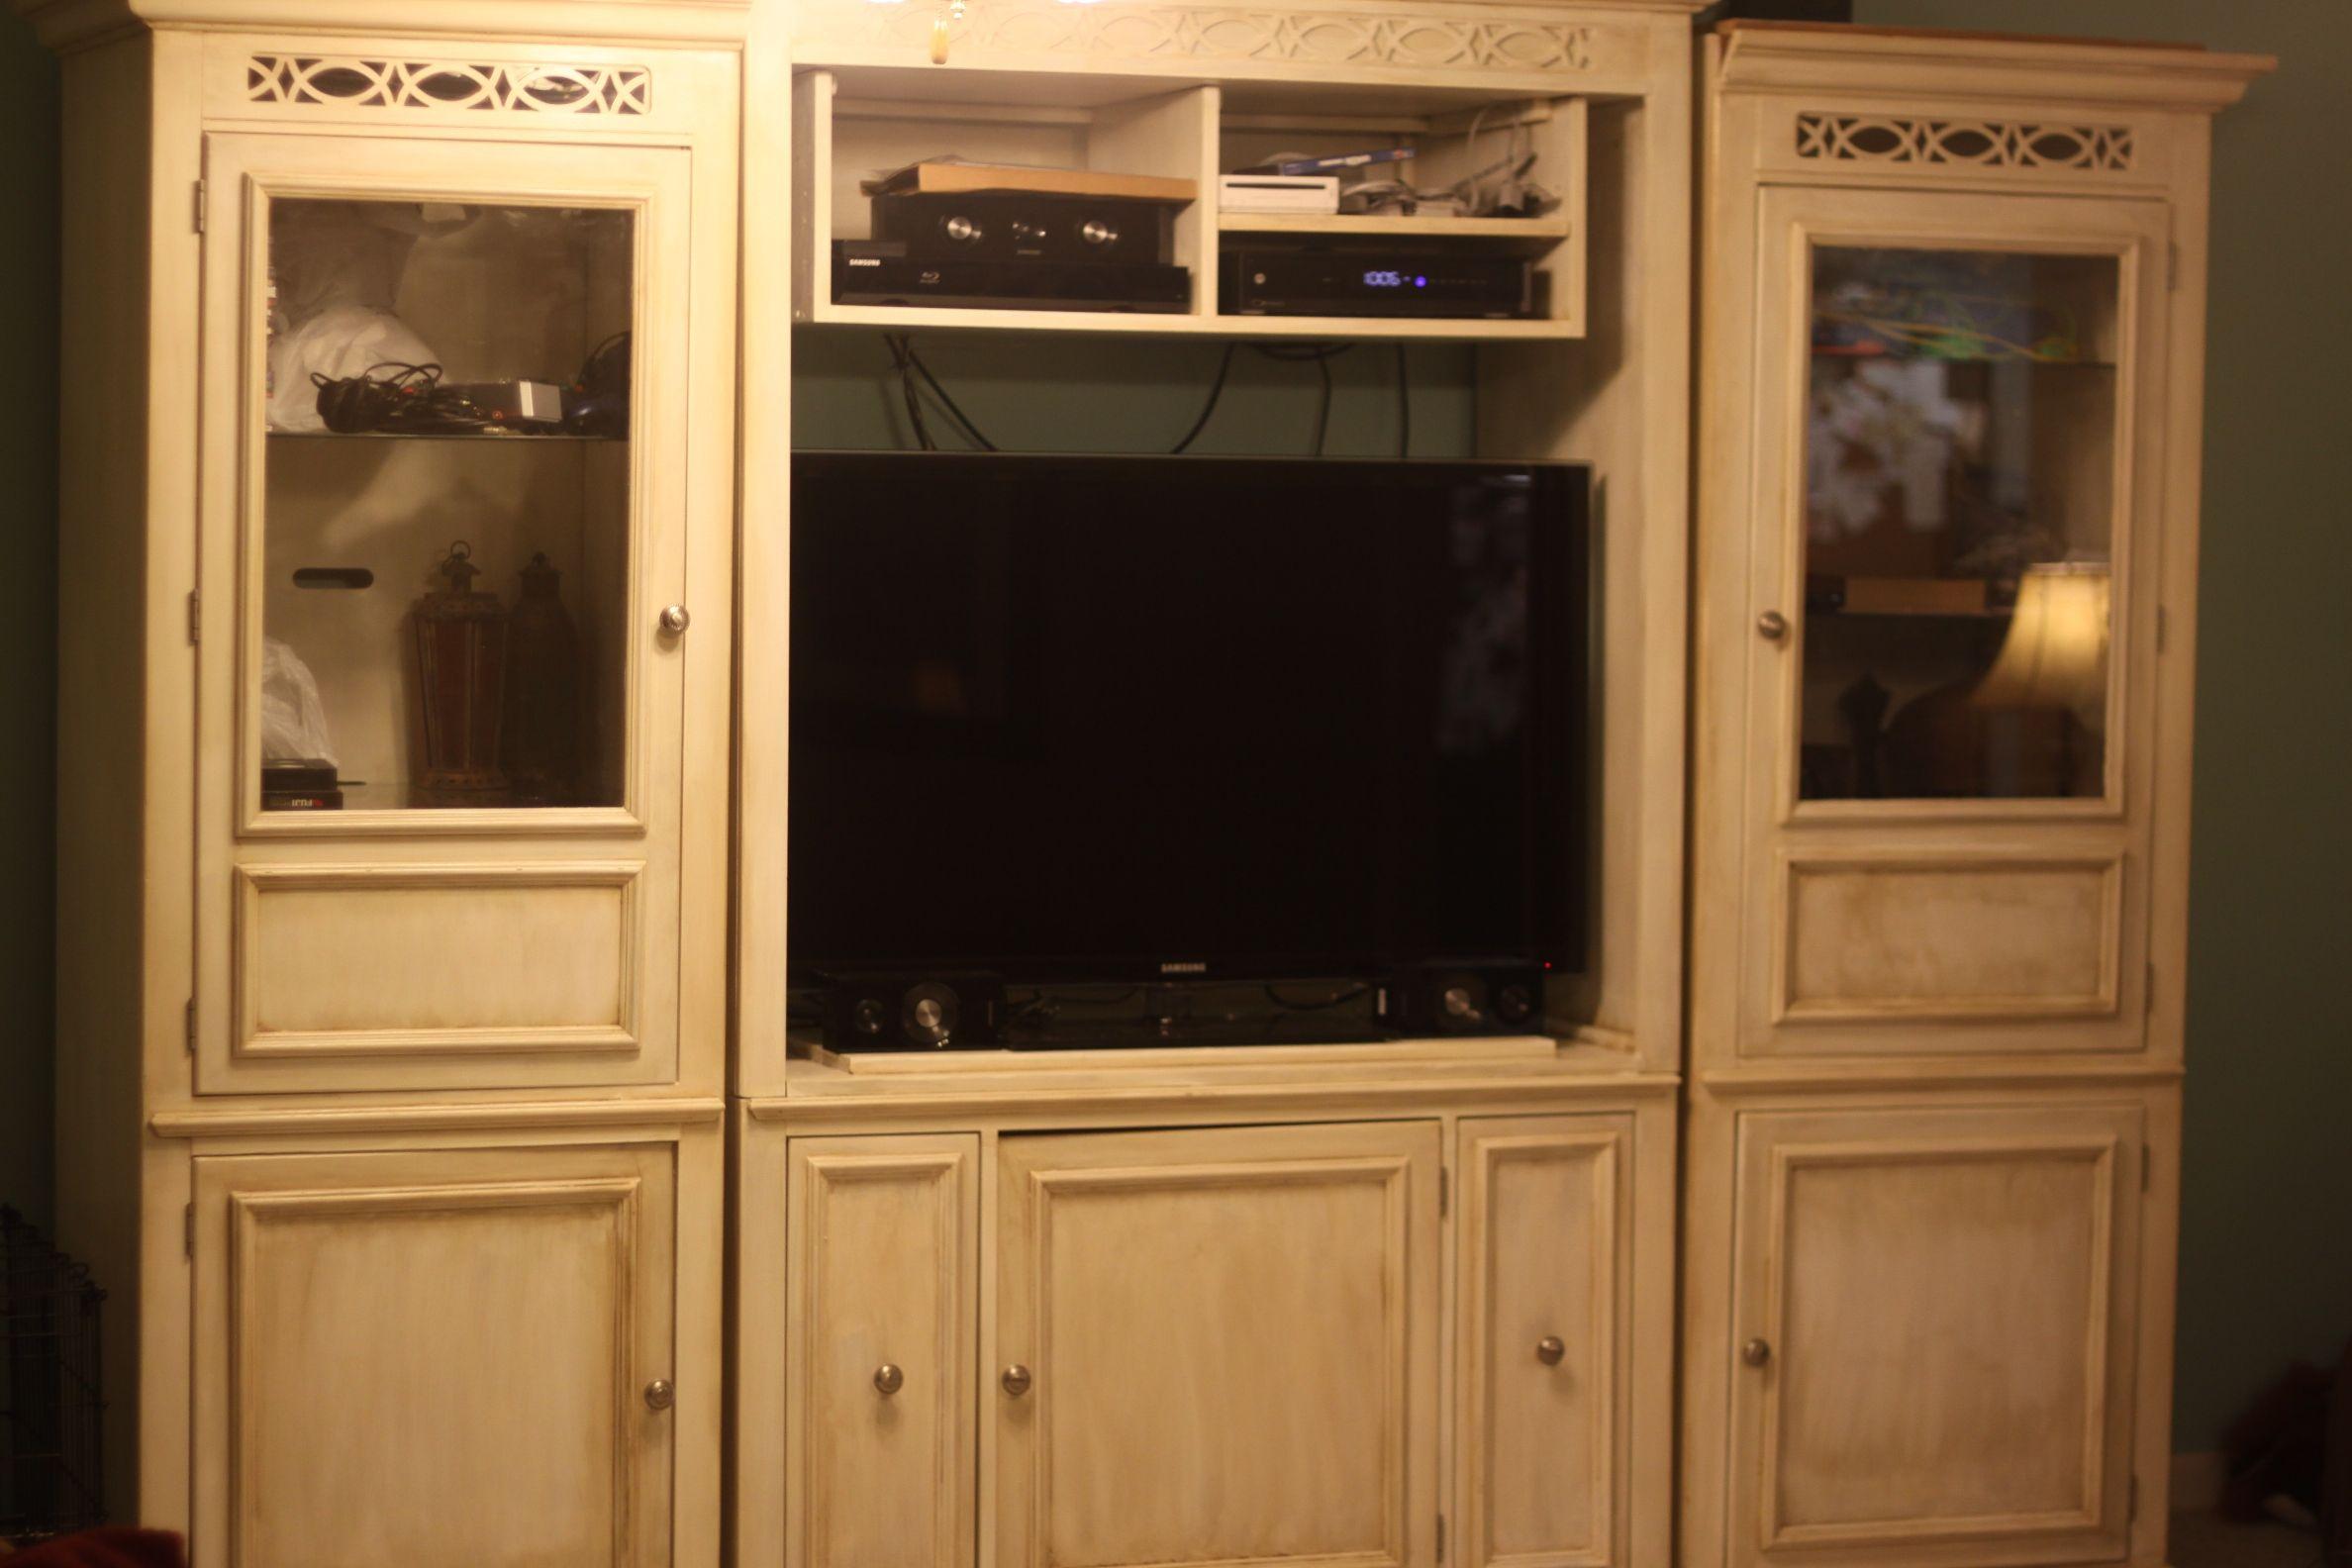 Rust-oleum Cabinet Transformations - refinish cabinets ...